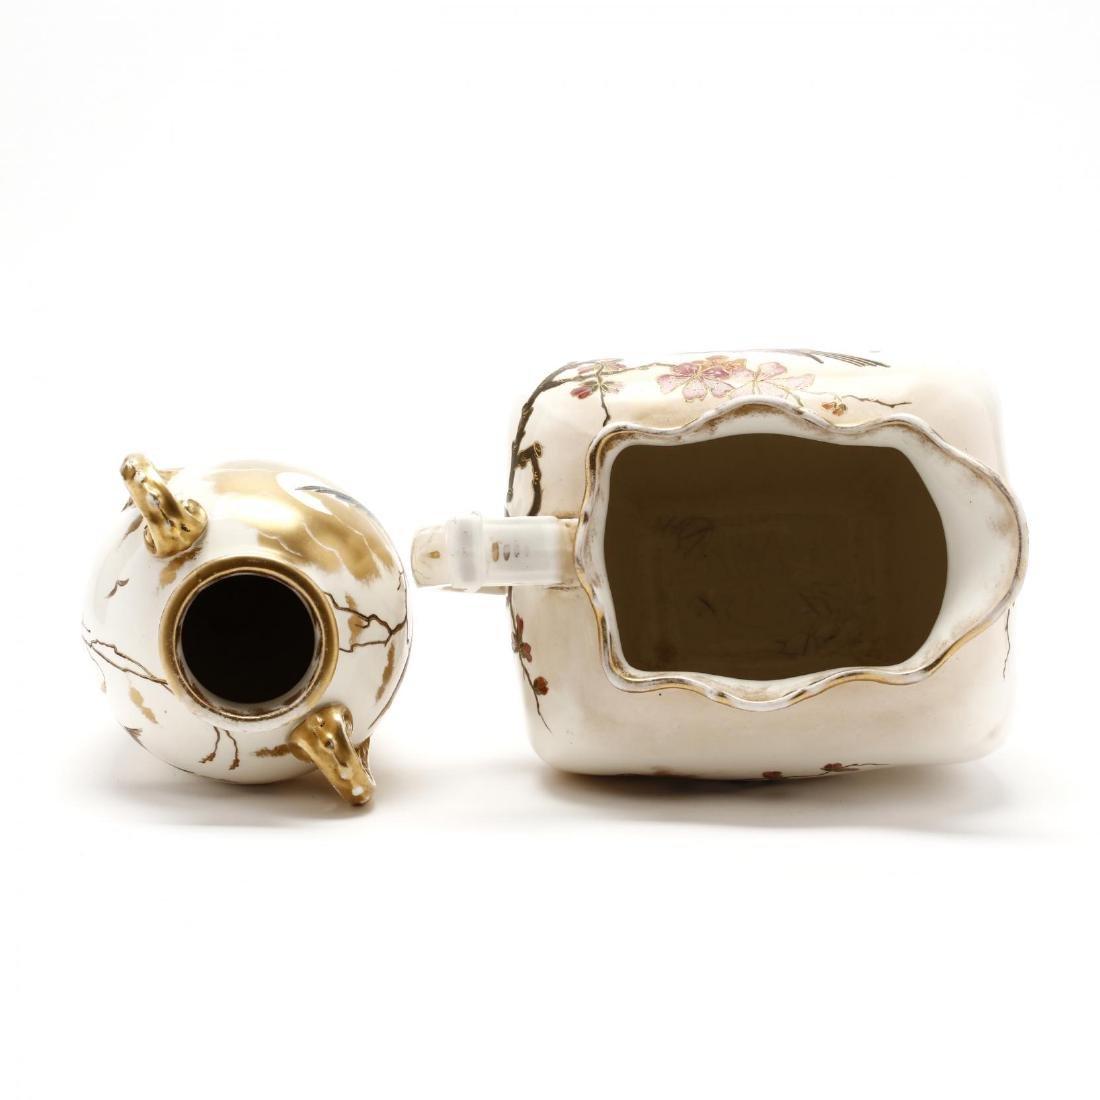 Royal Bonn, Two Porcelain Accessories - 3